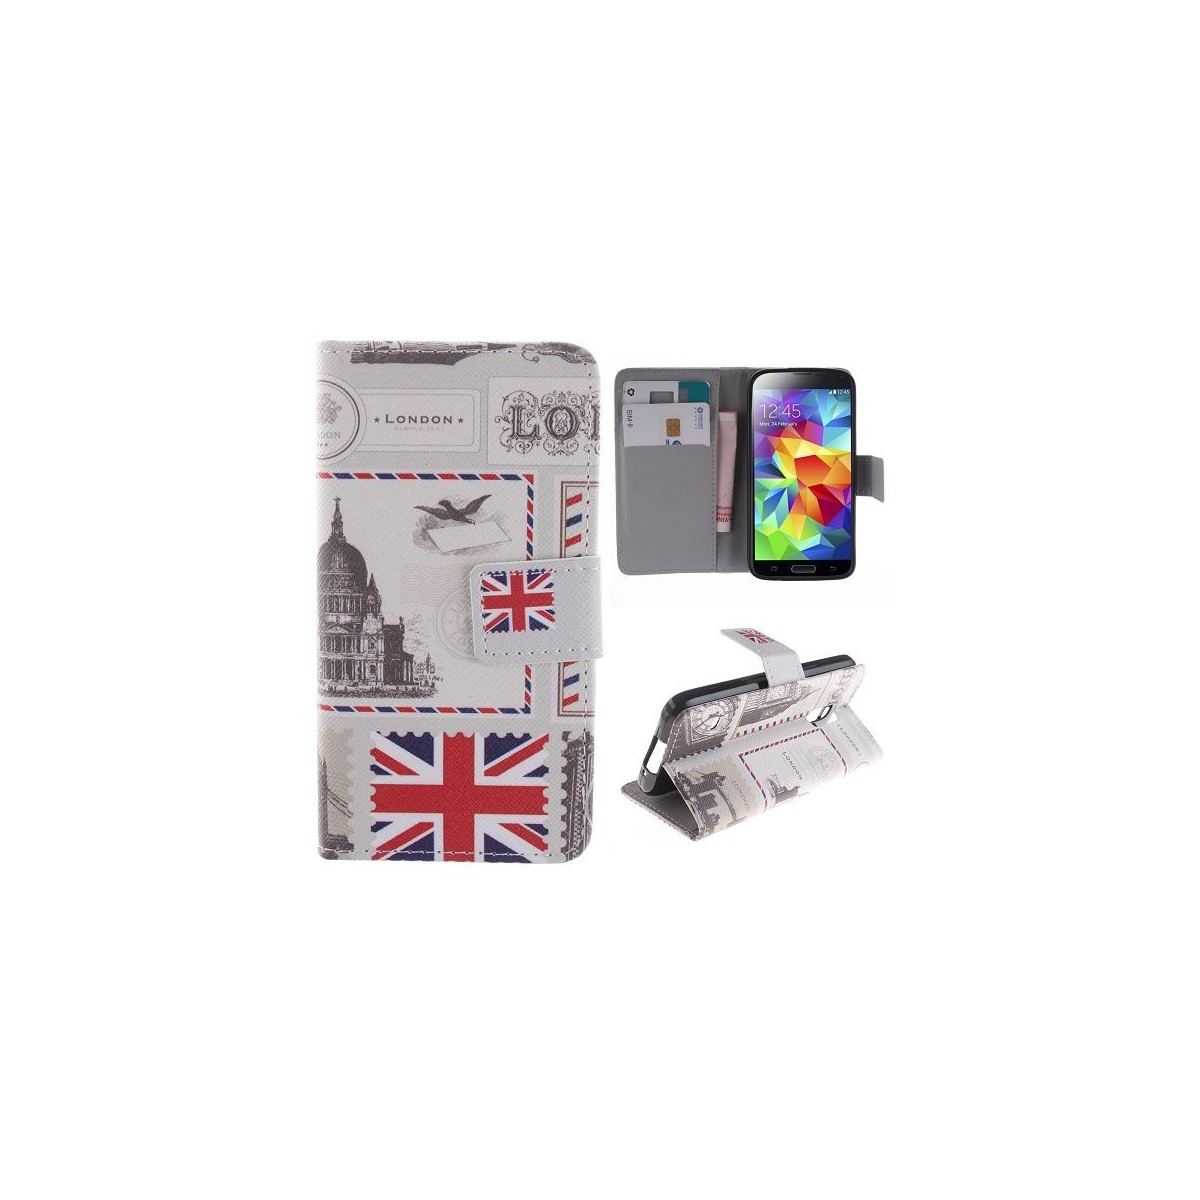 Etui Galaxy S5 Mini motif drapeau UK